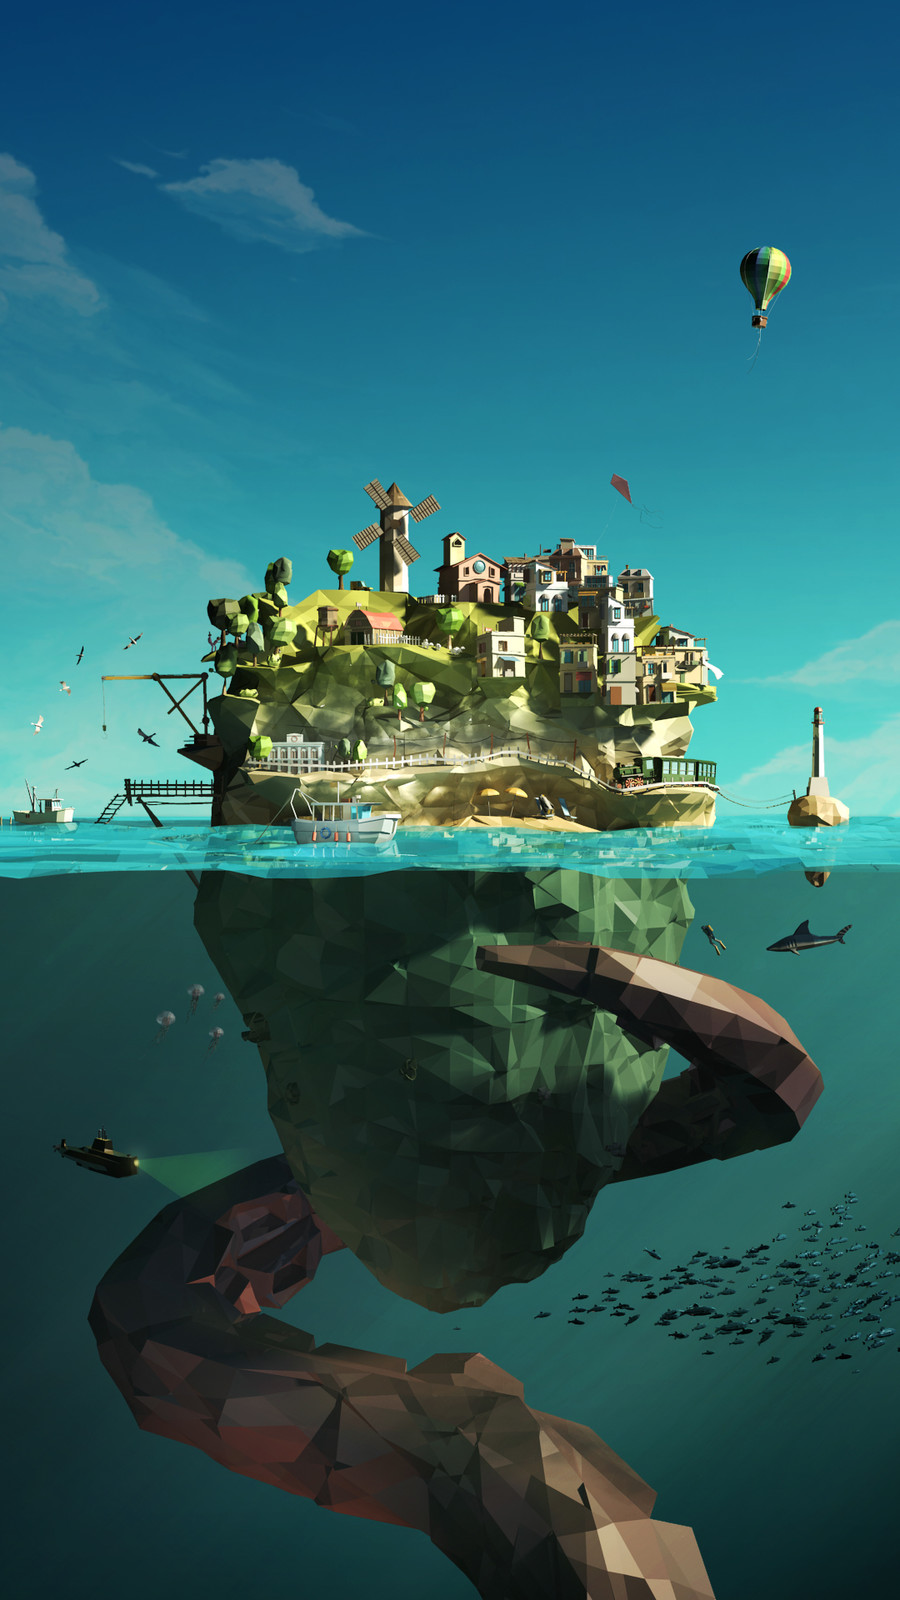 DEAILAND - THE ISLAND